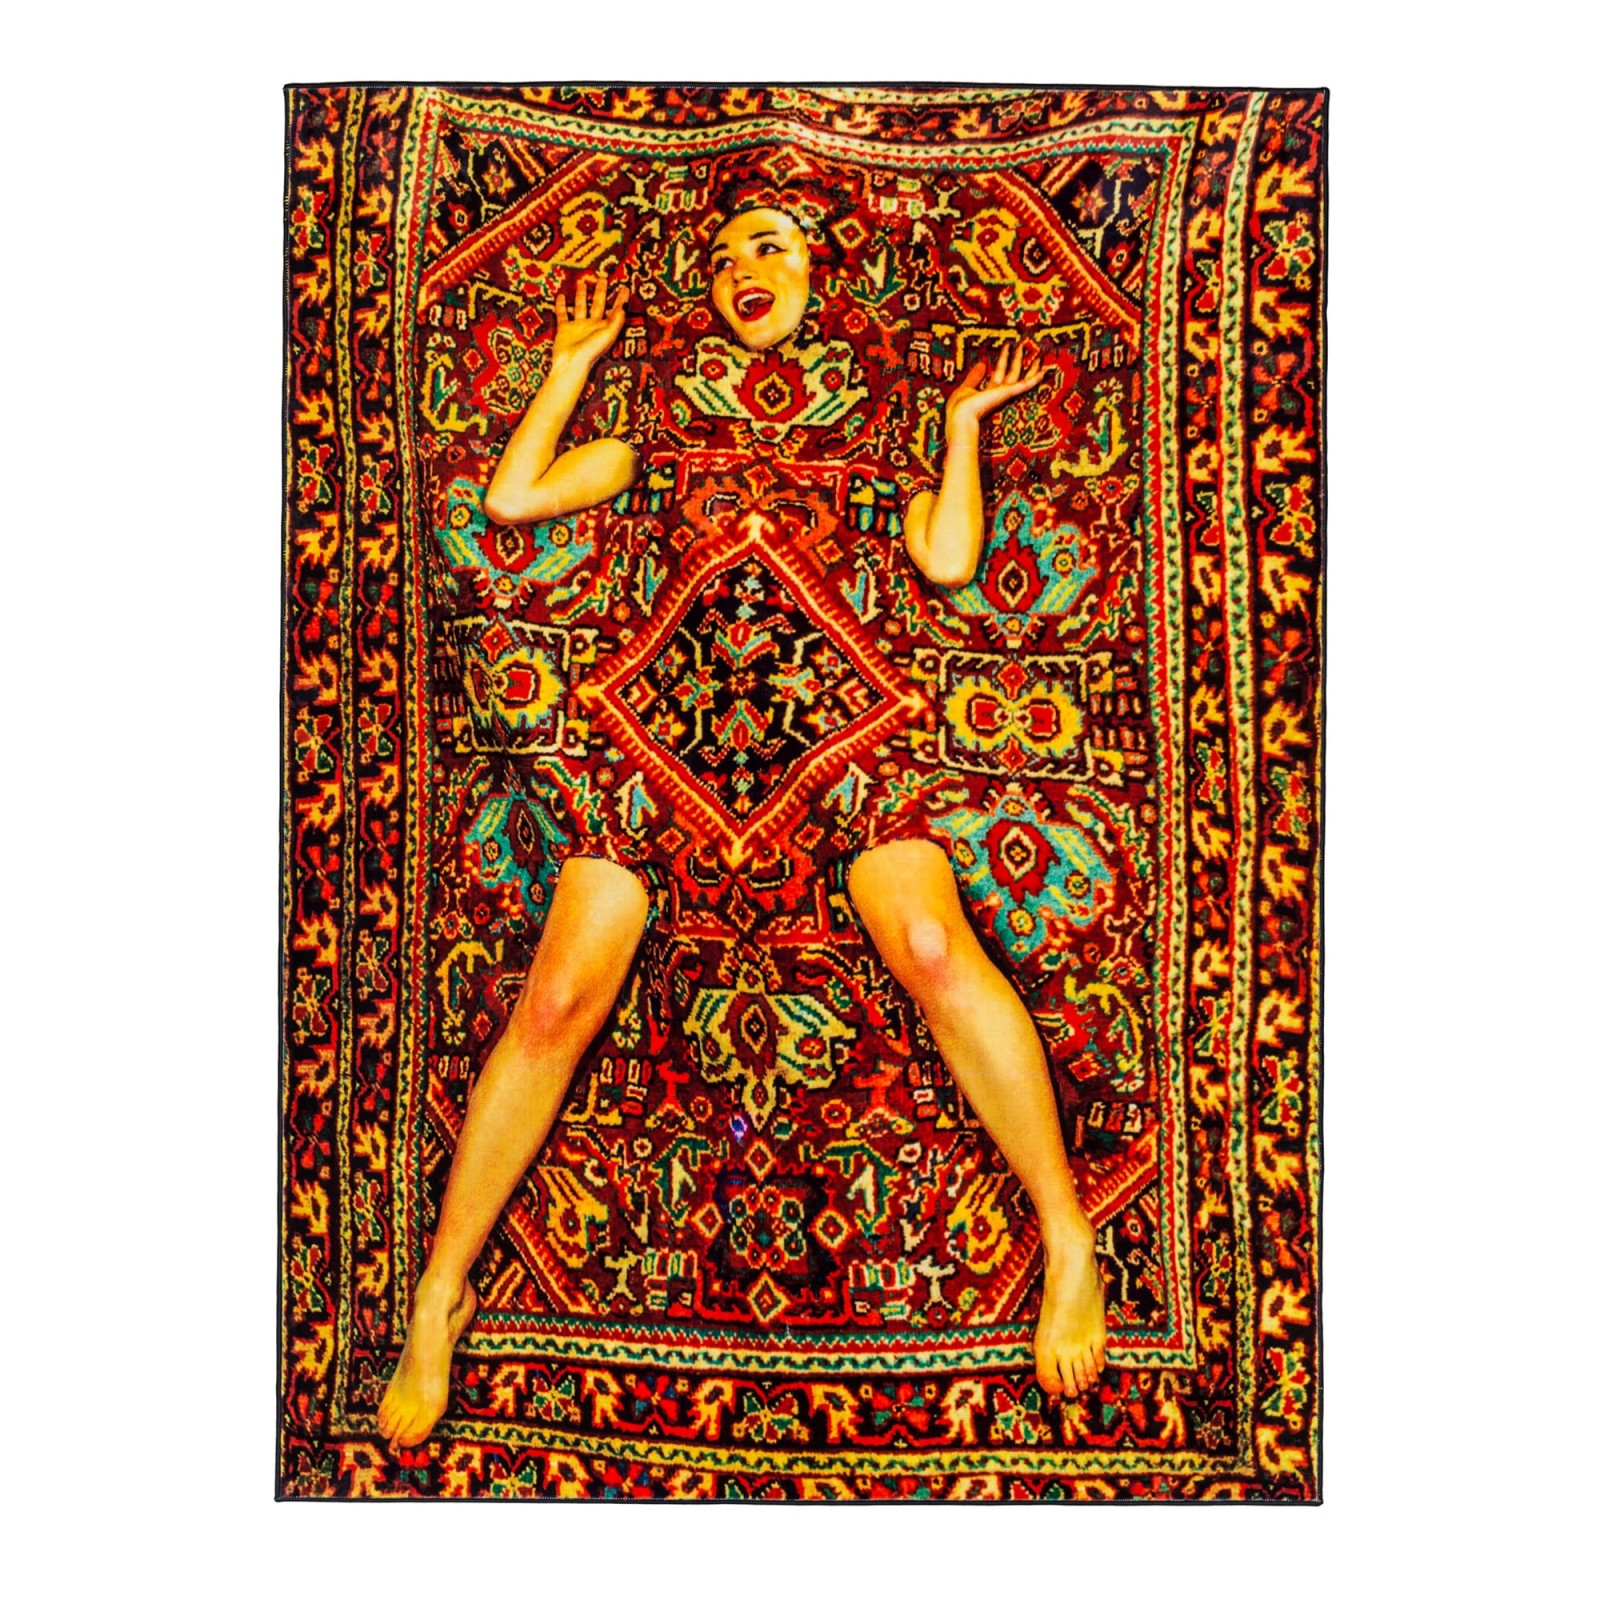 Toiletpaper Lady on Carpet Rectangular Rug